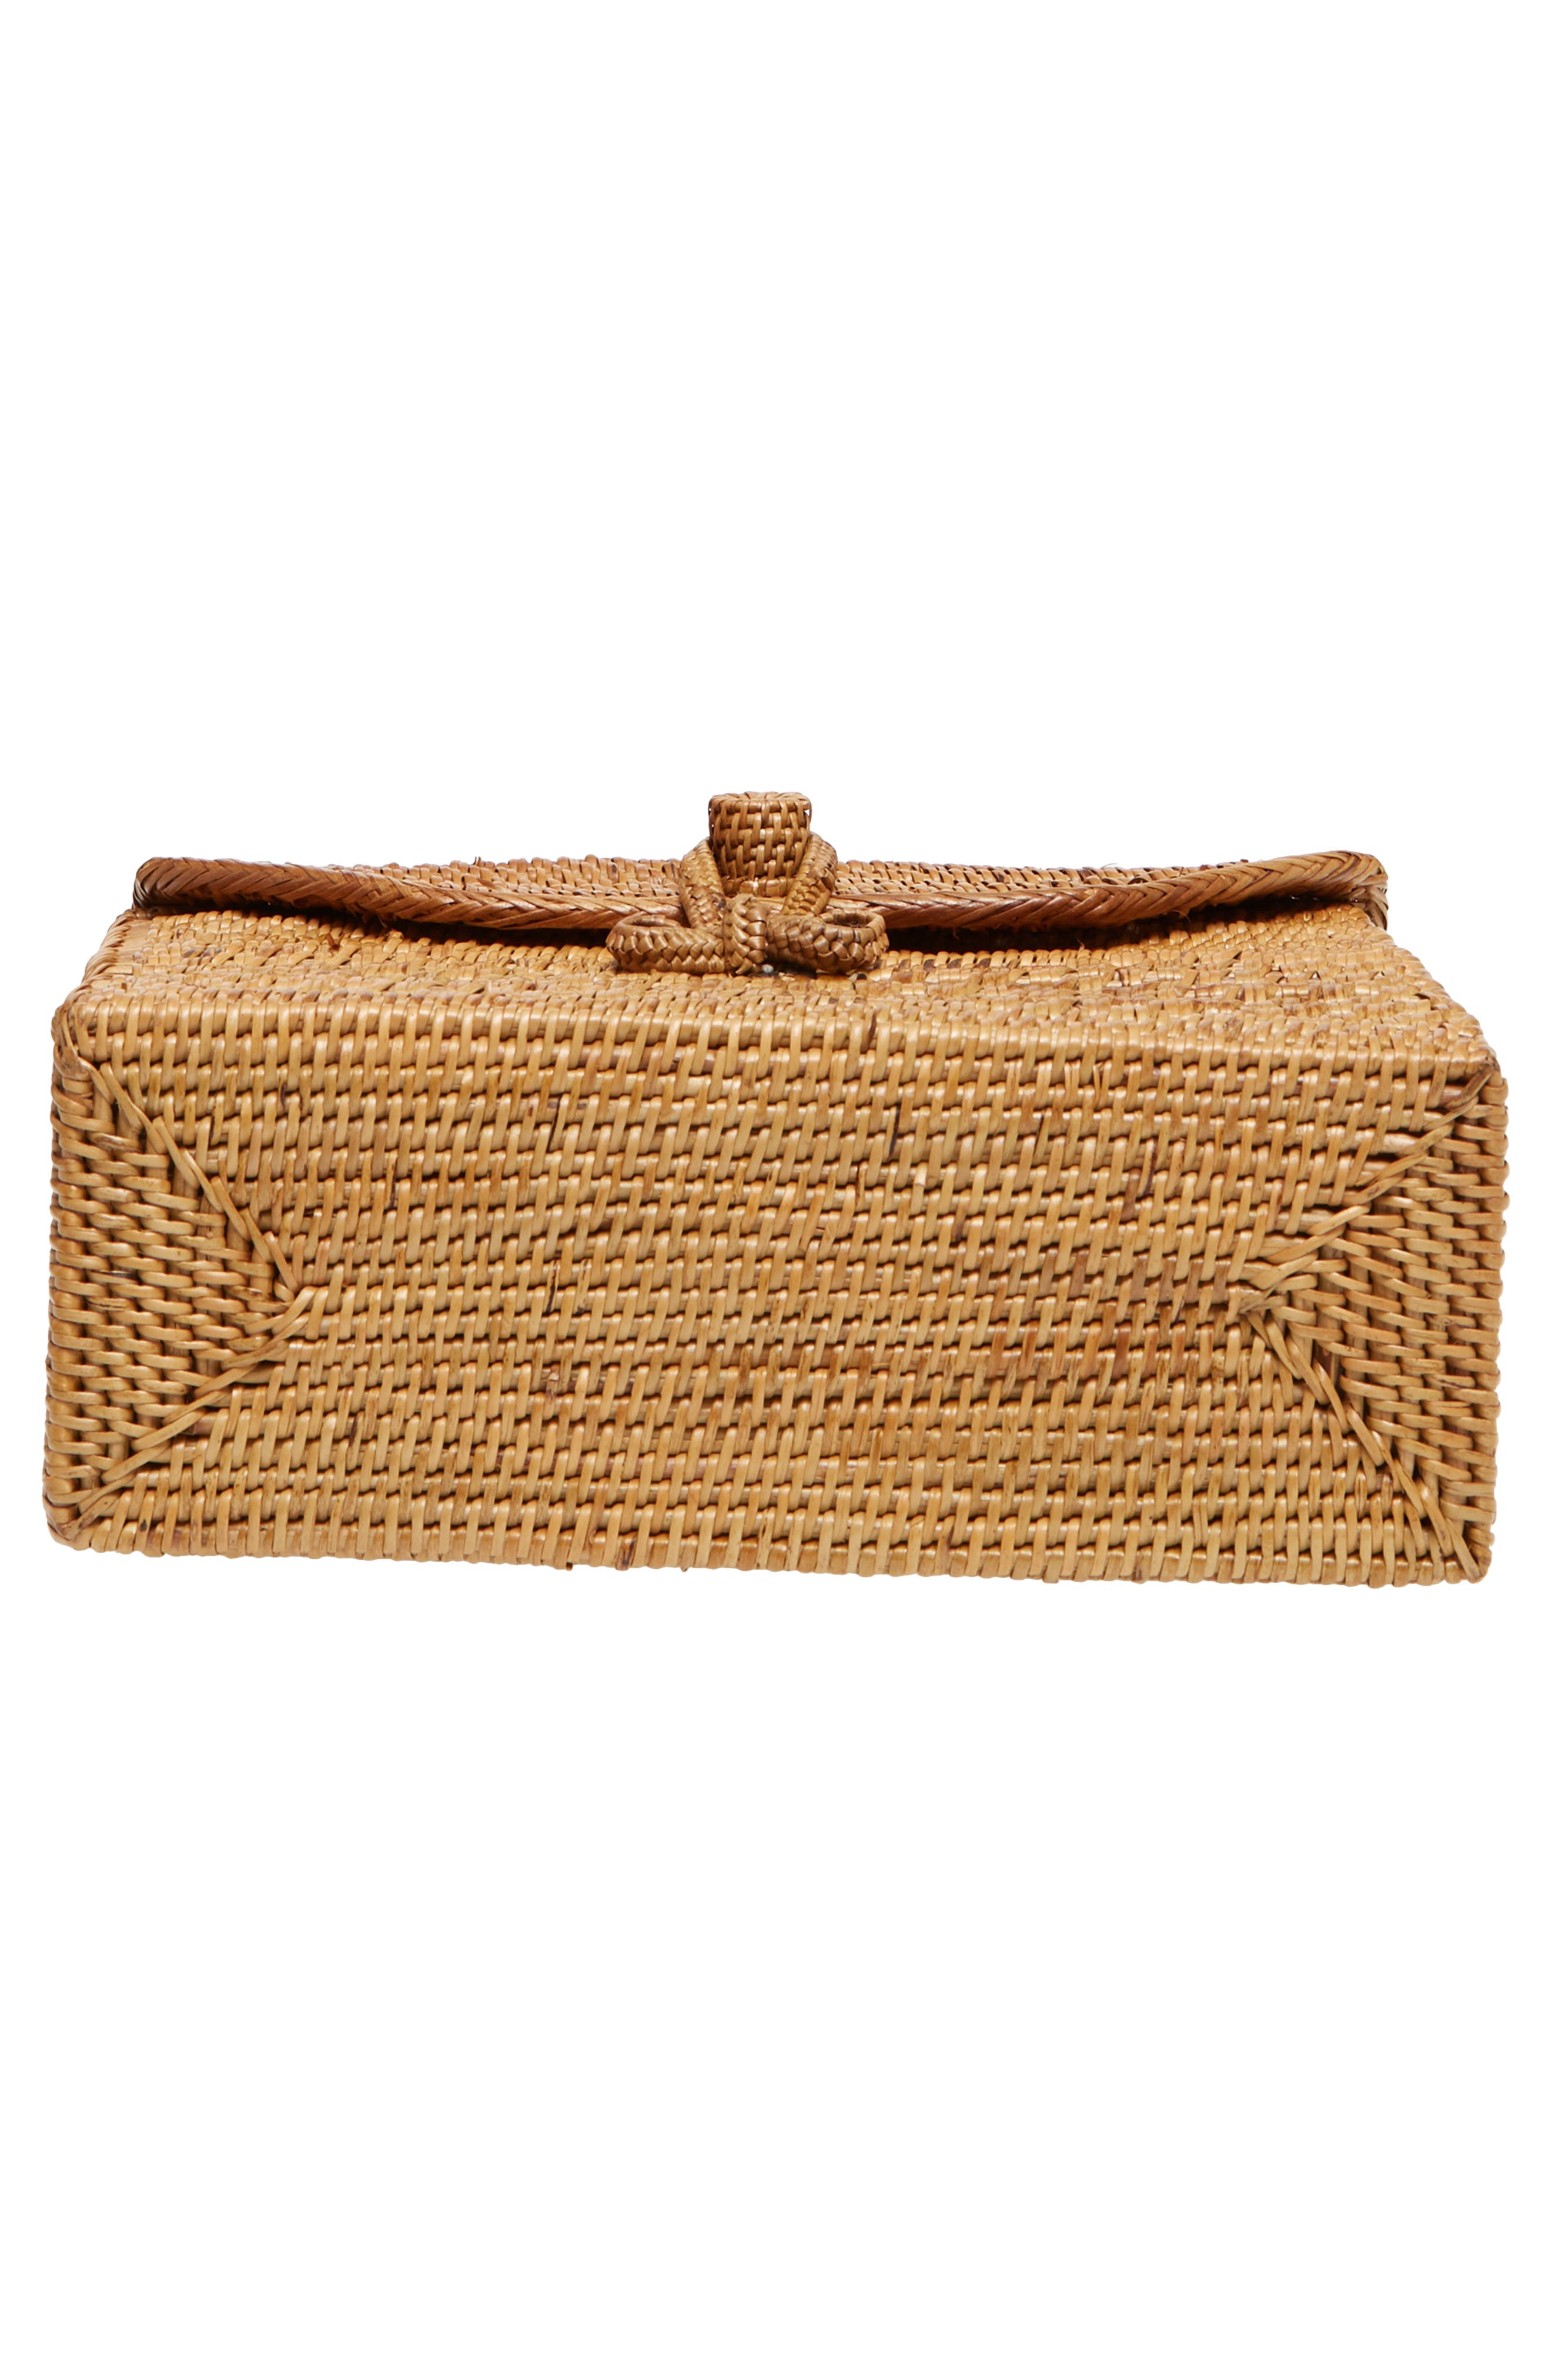 Woven Rattan Box Crossbody Bag,                             Alternate thumbnail 6, color,                             Tan